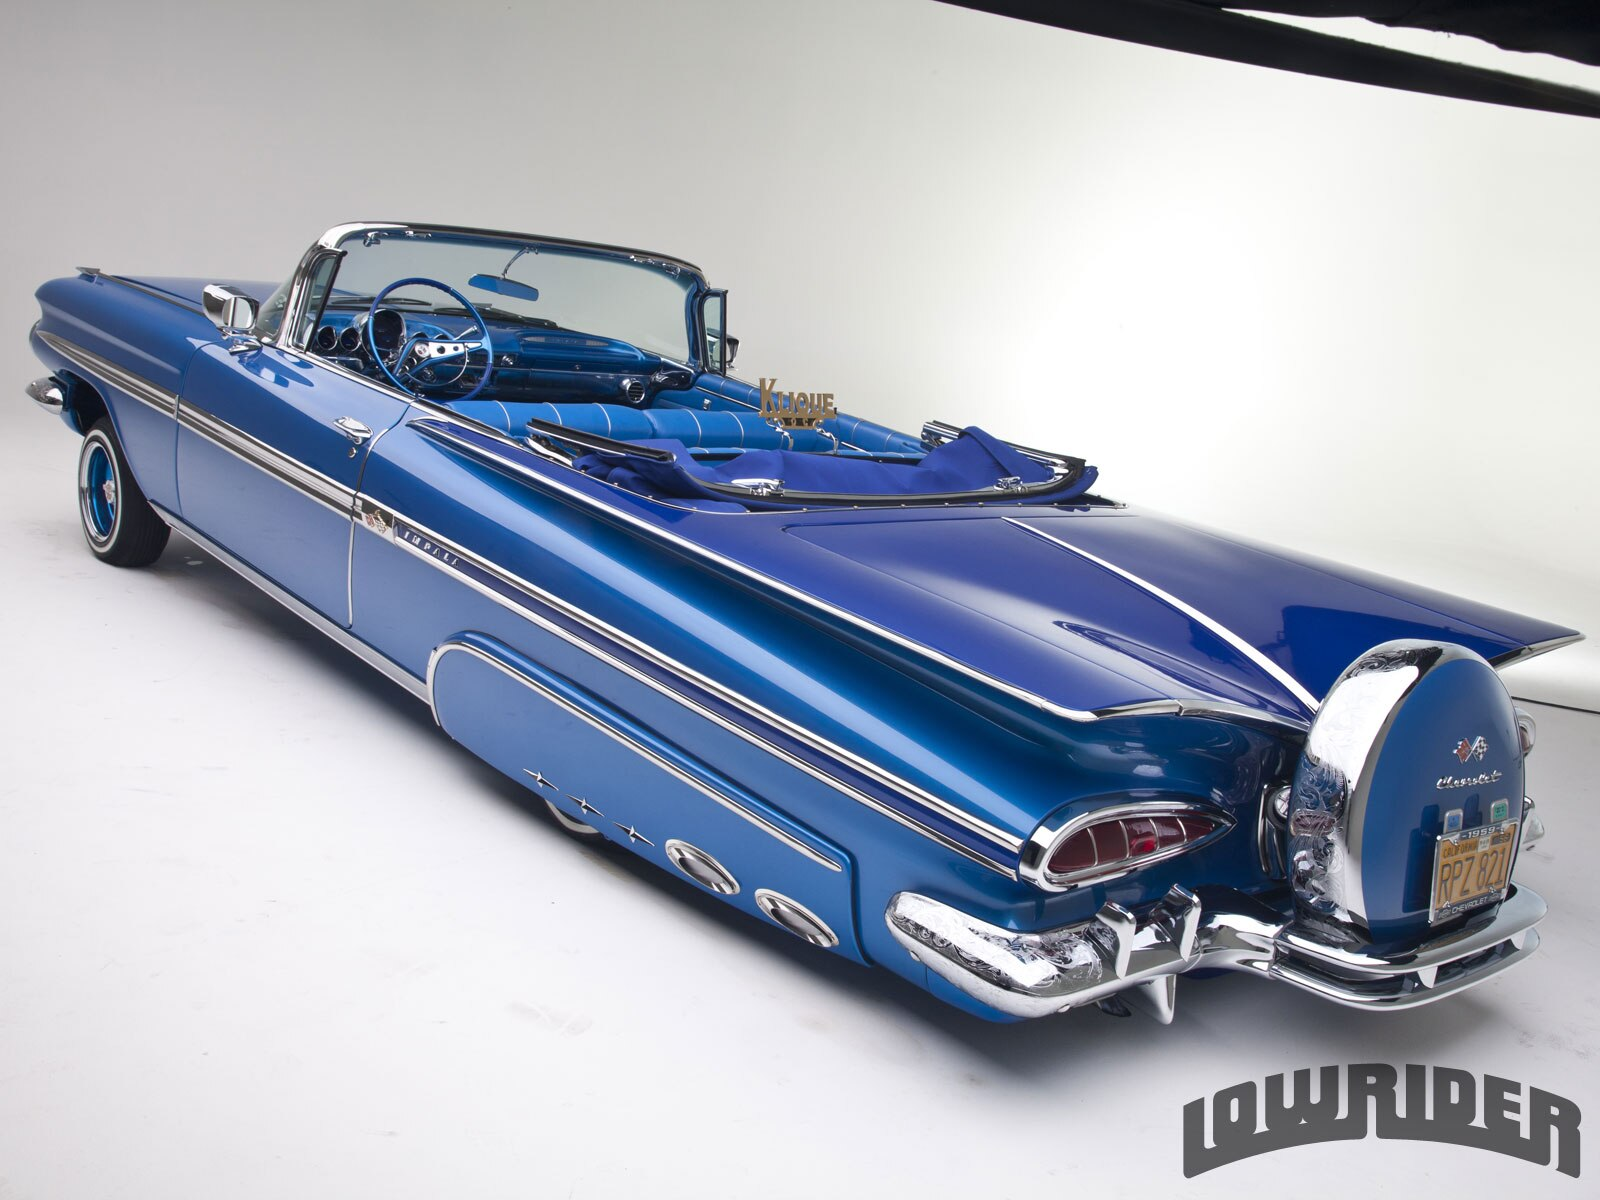 1209-lrmp-15-o-1959-chevrolet-impala-convertible-driver-side-rear-quarter-view1